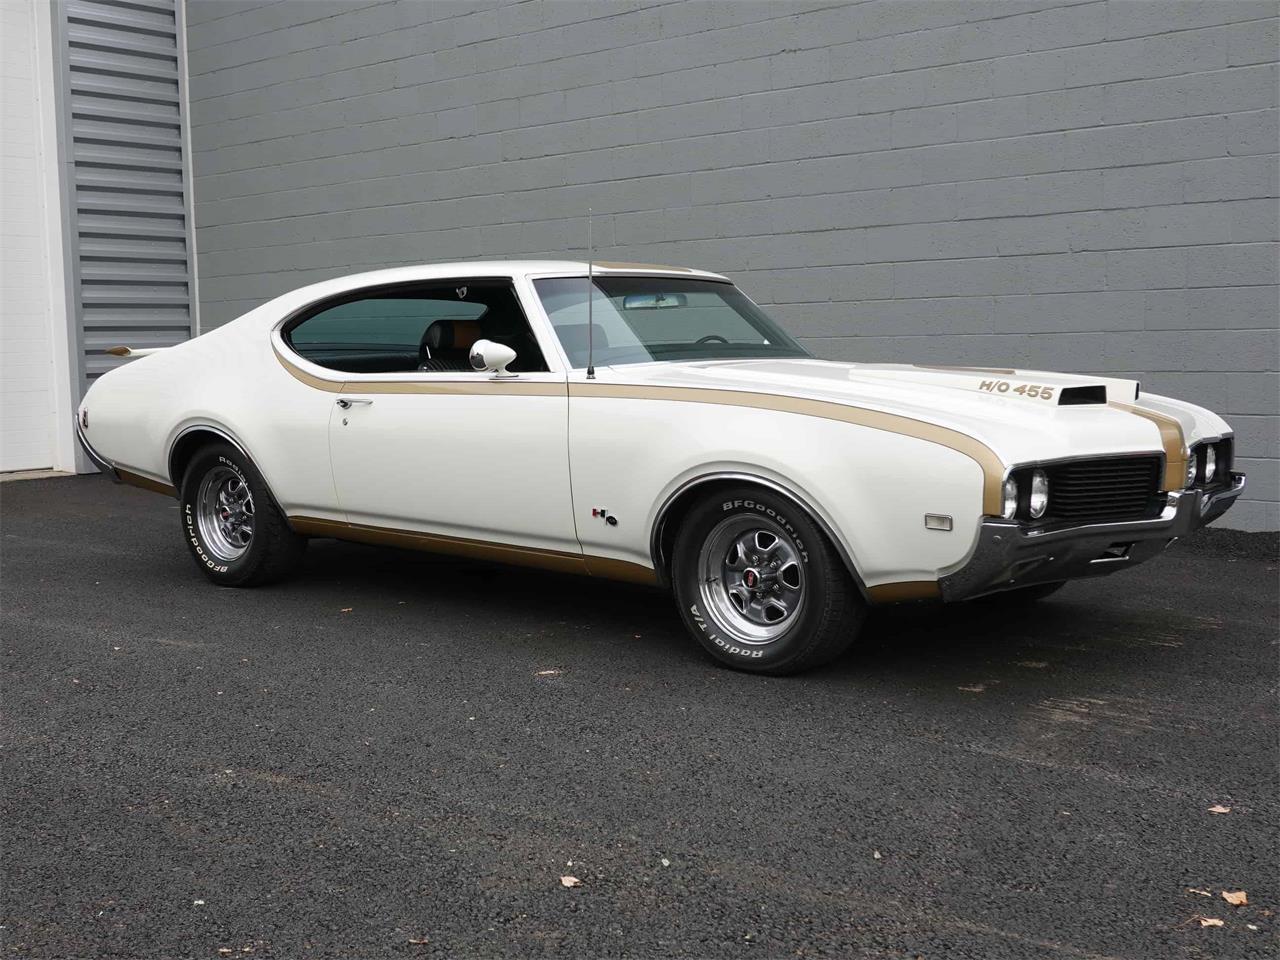 1969 Oldsmobile Hurst (CC-1383017) for sale in Pittsburgh, Pennsylvania